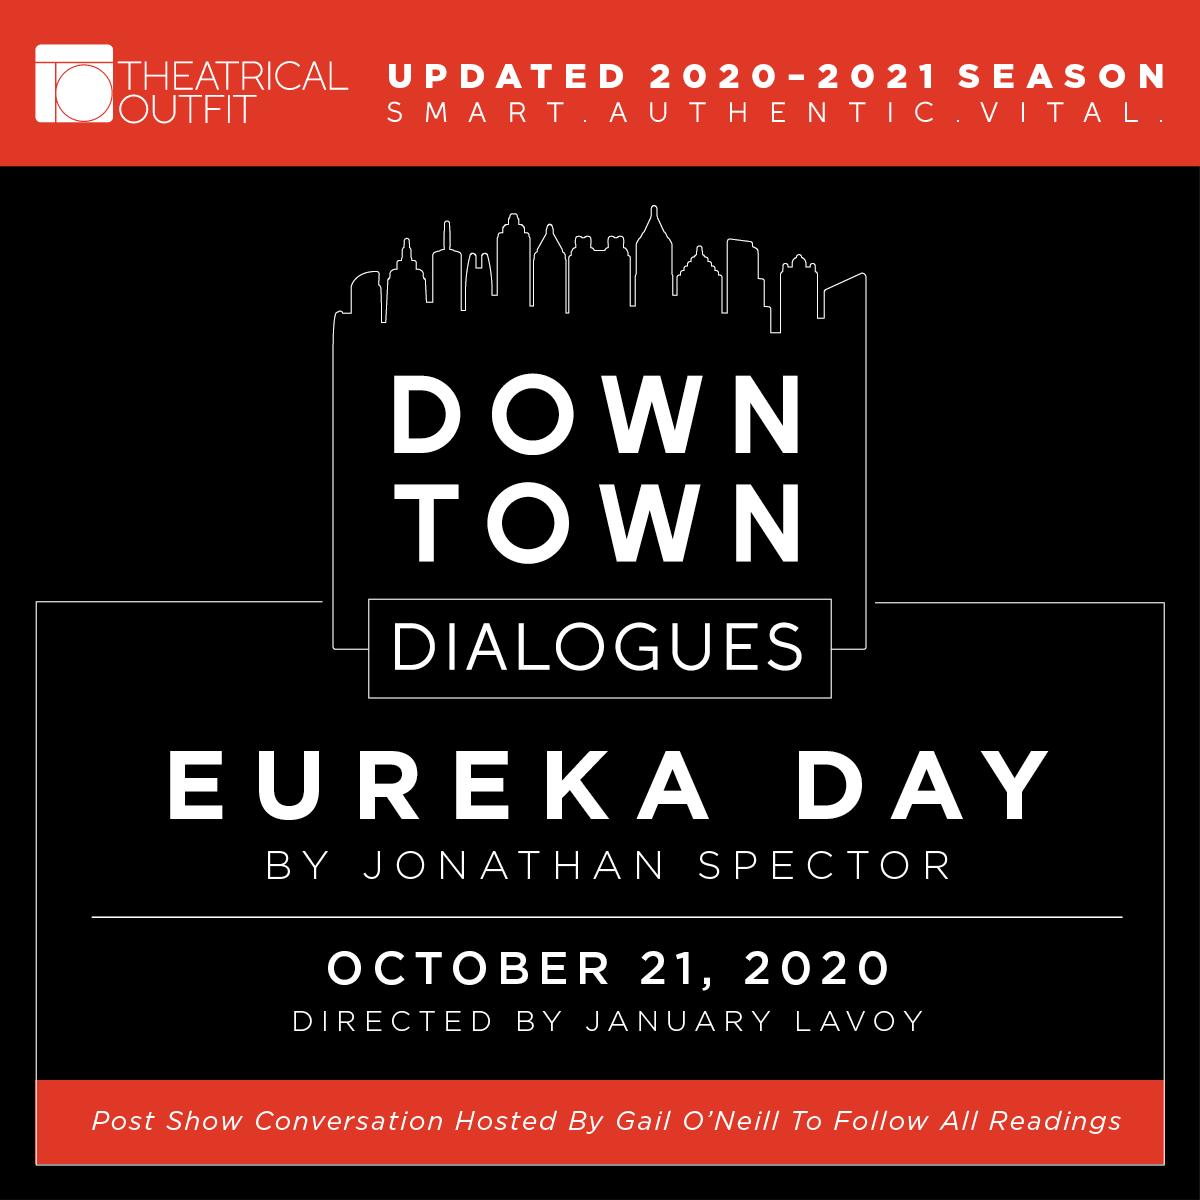 2020-21_TO_Season_SOCIAL_1200x1200_v1_DTD-Eureka